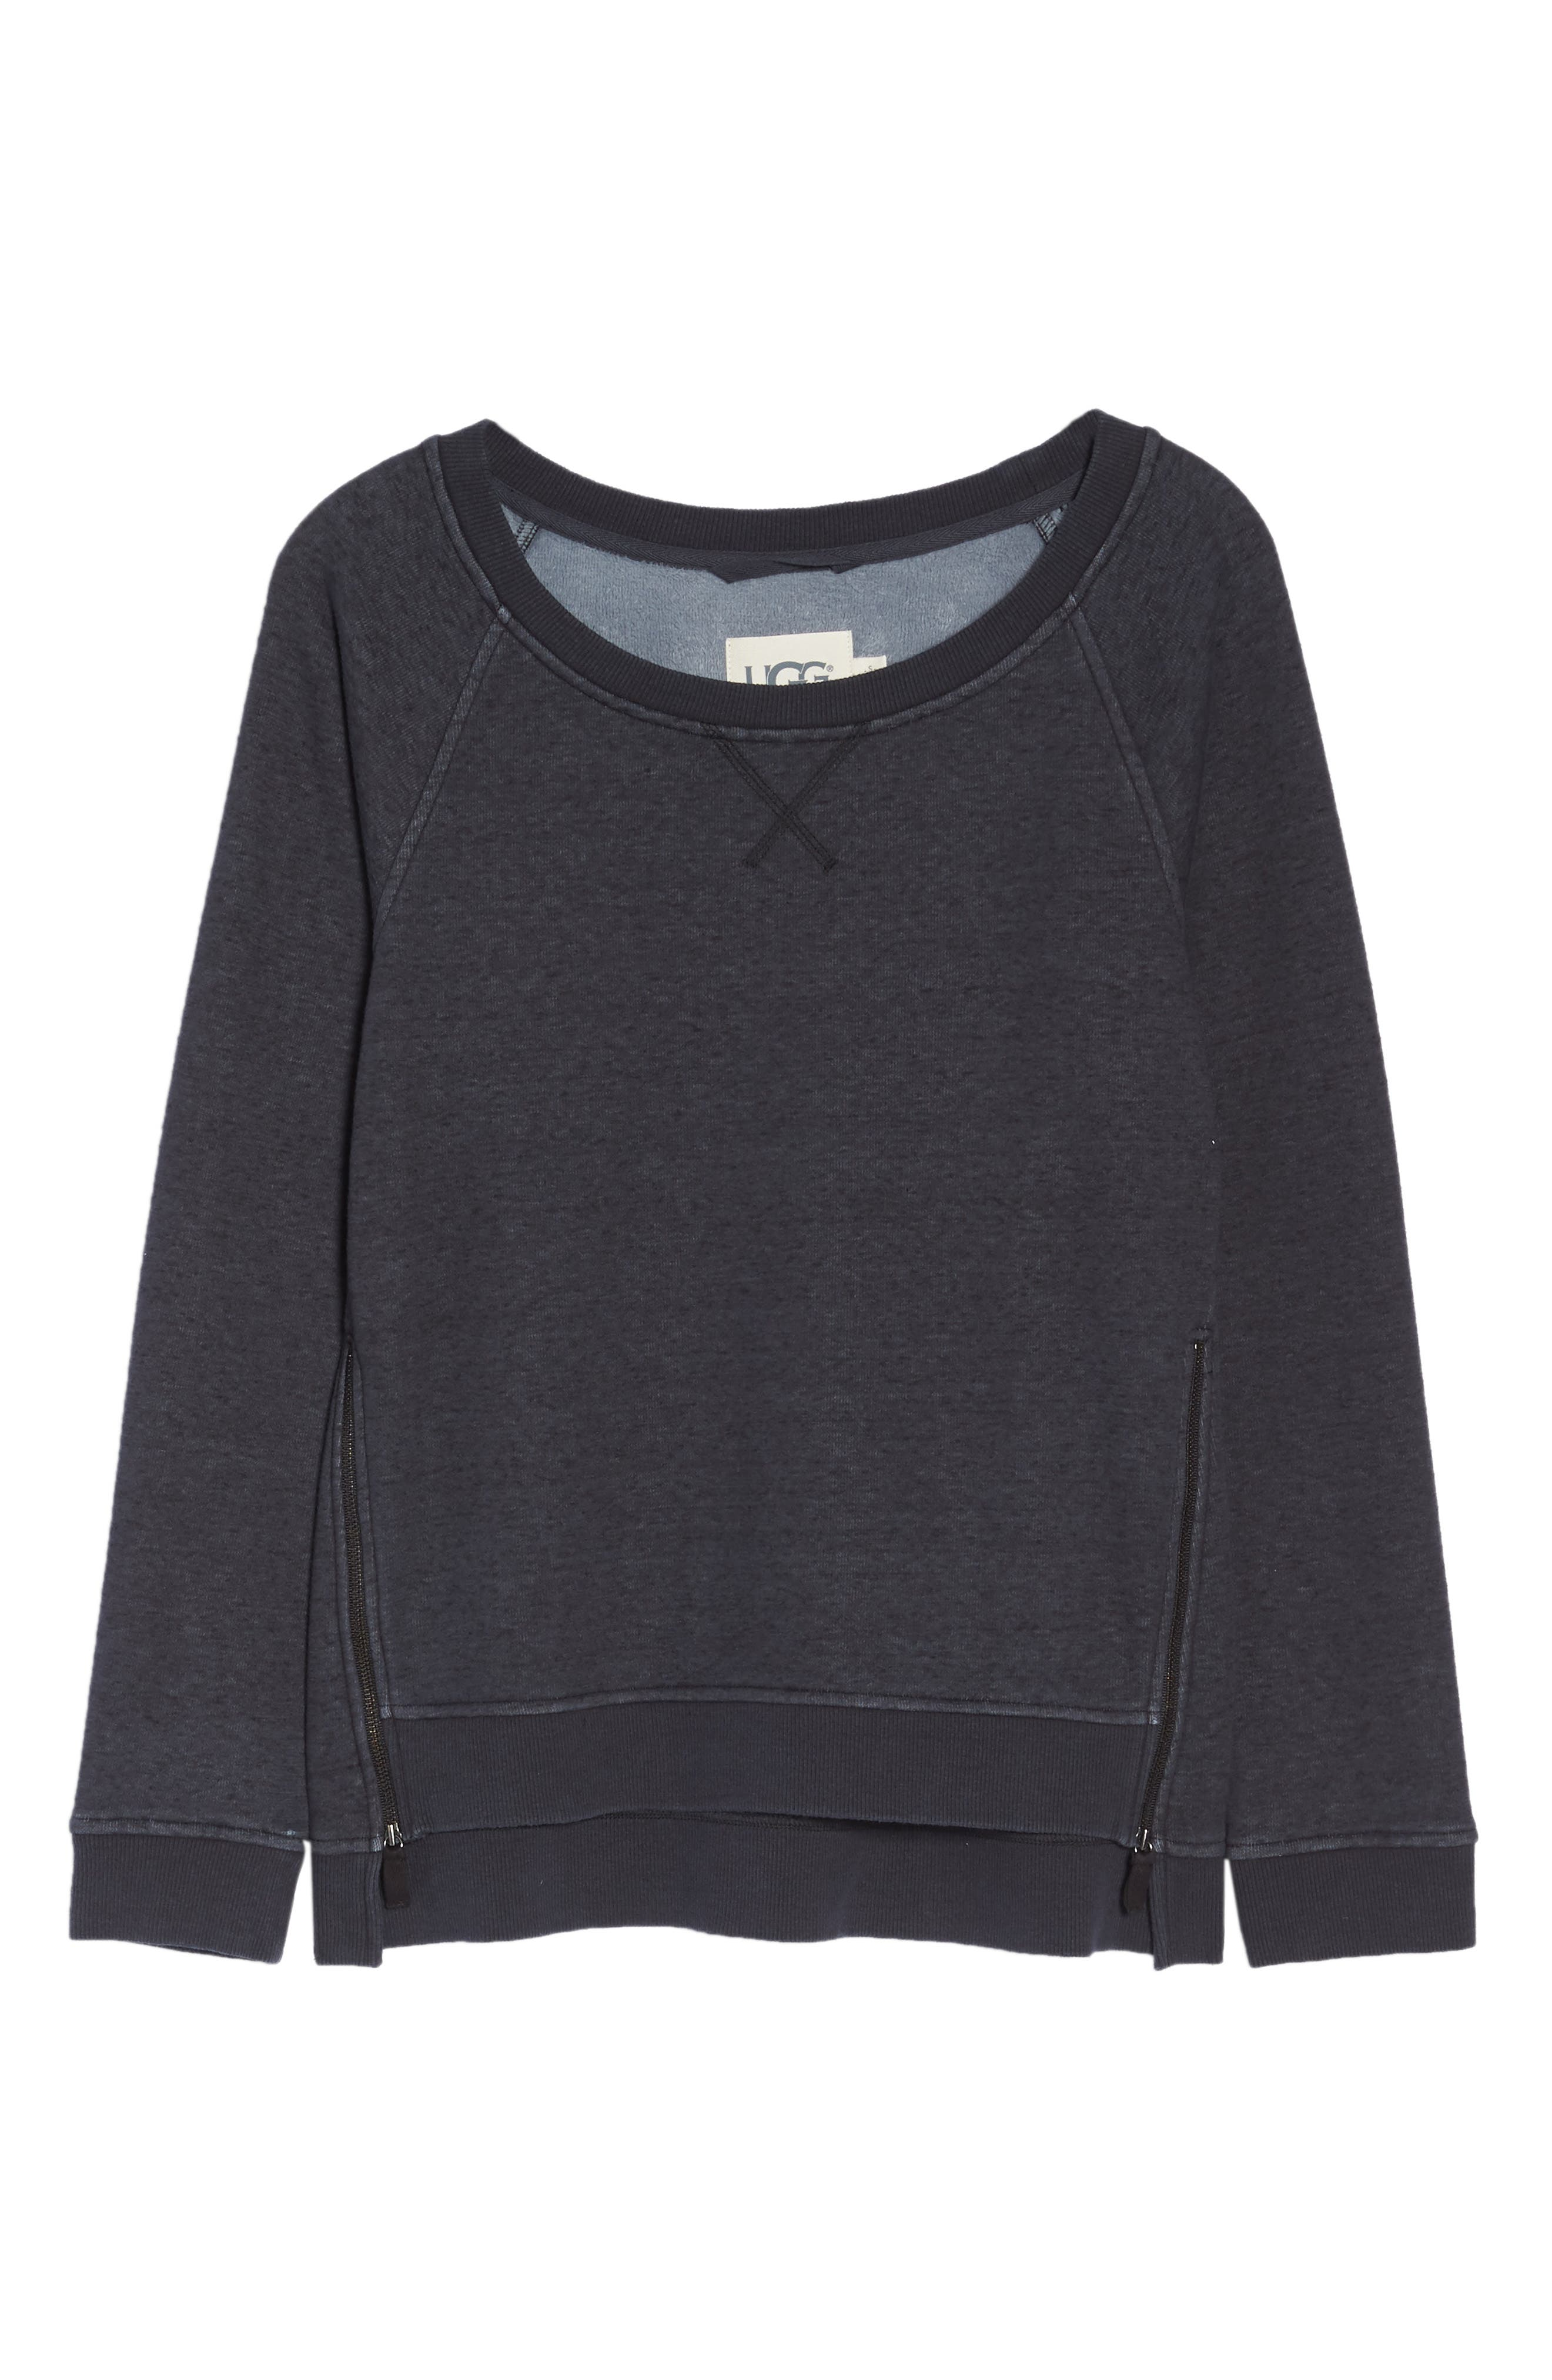 Morgan Sweatshirt,                             Alternate thumbnail 6, color,                             BLACK HEATHER